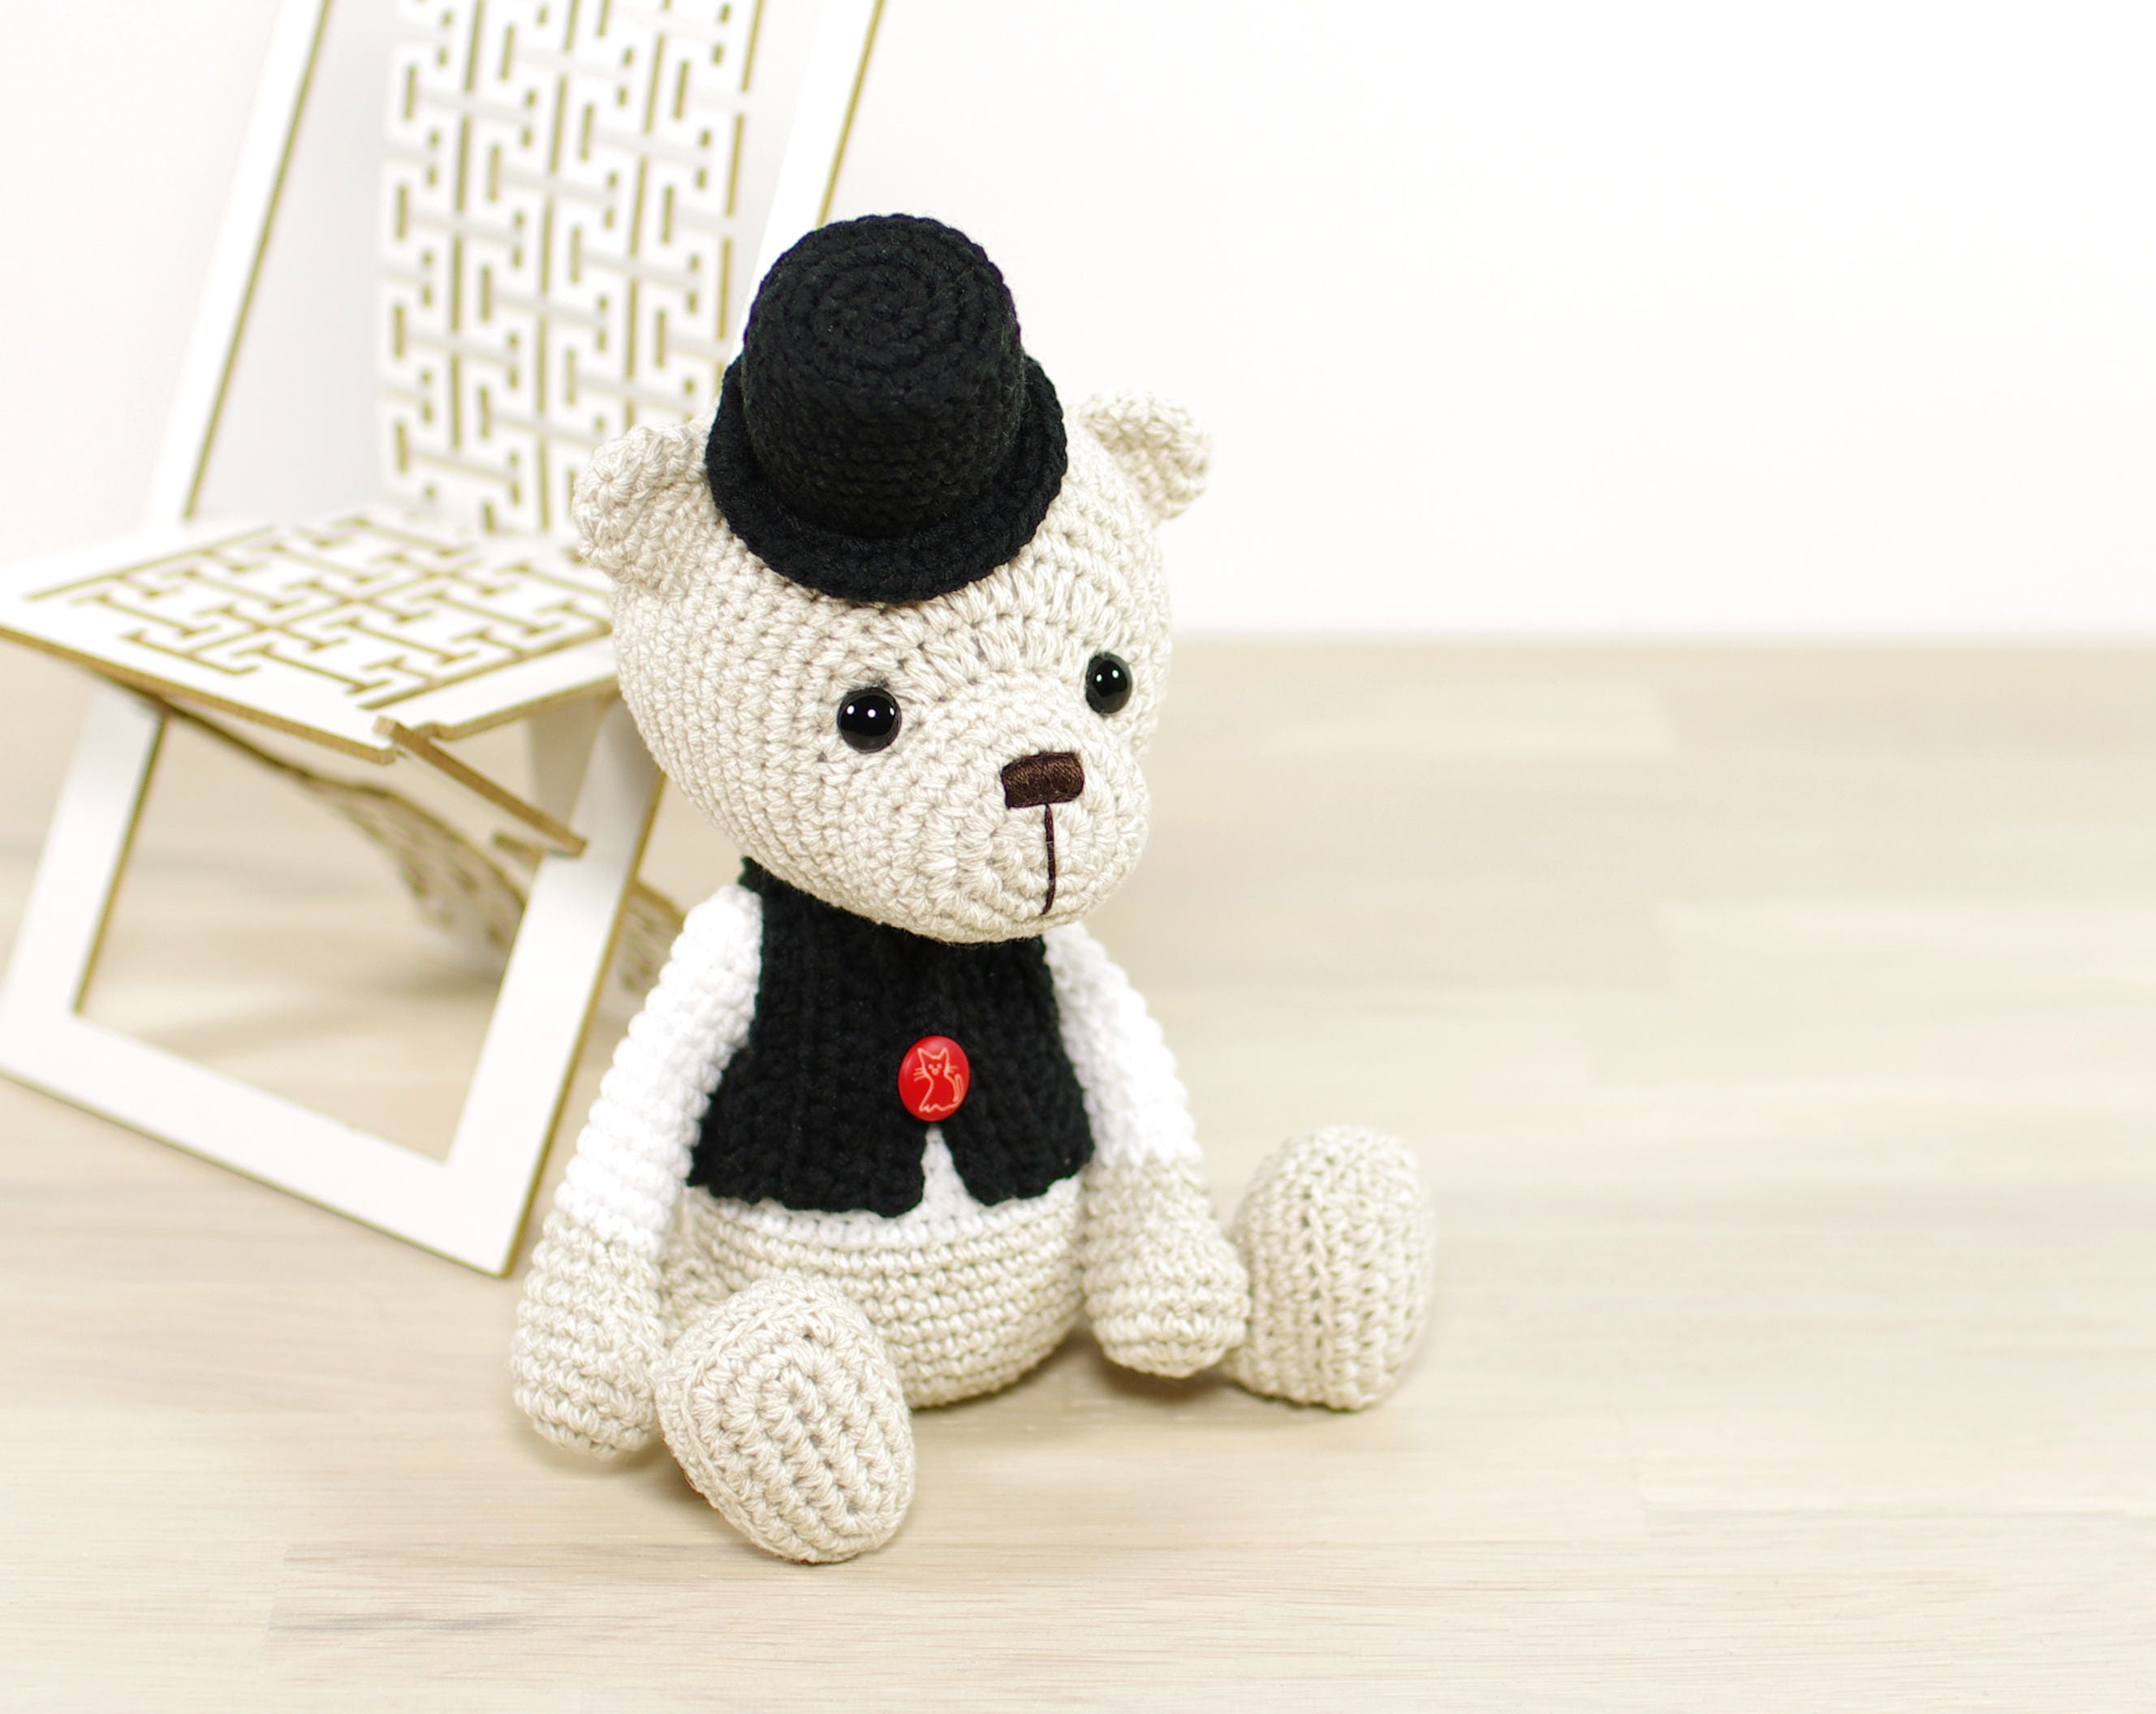 Pattern Teddy Bear In A Top Hat And Vest En 039 From